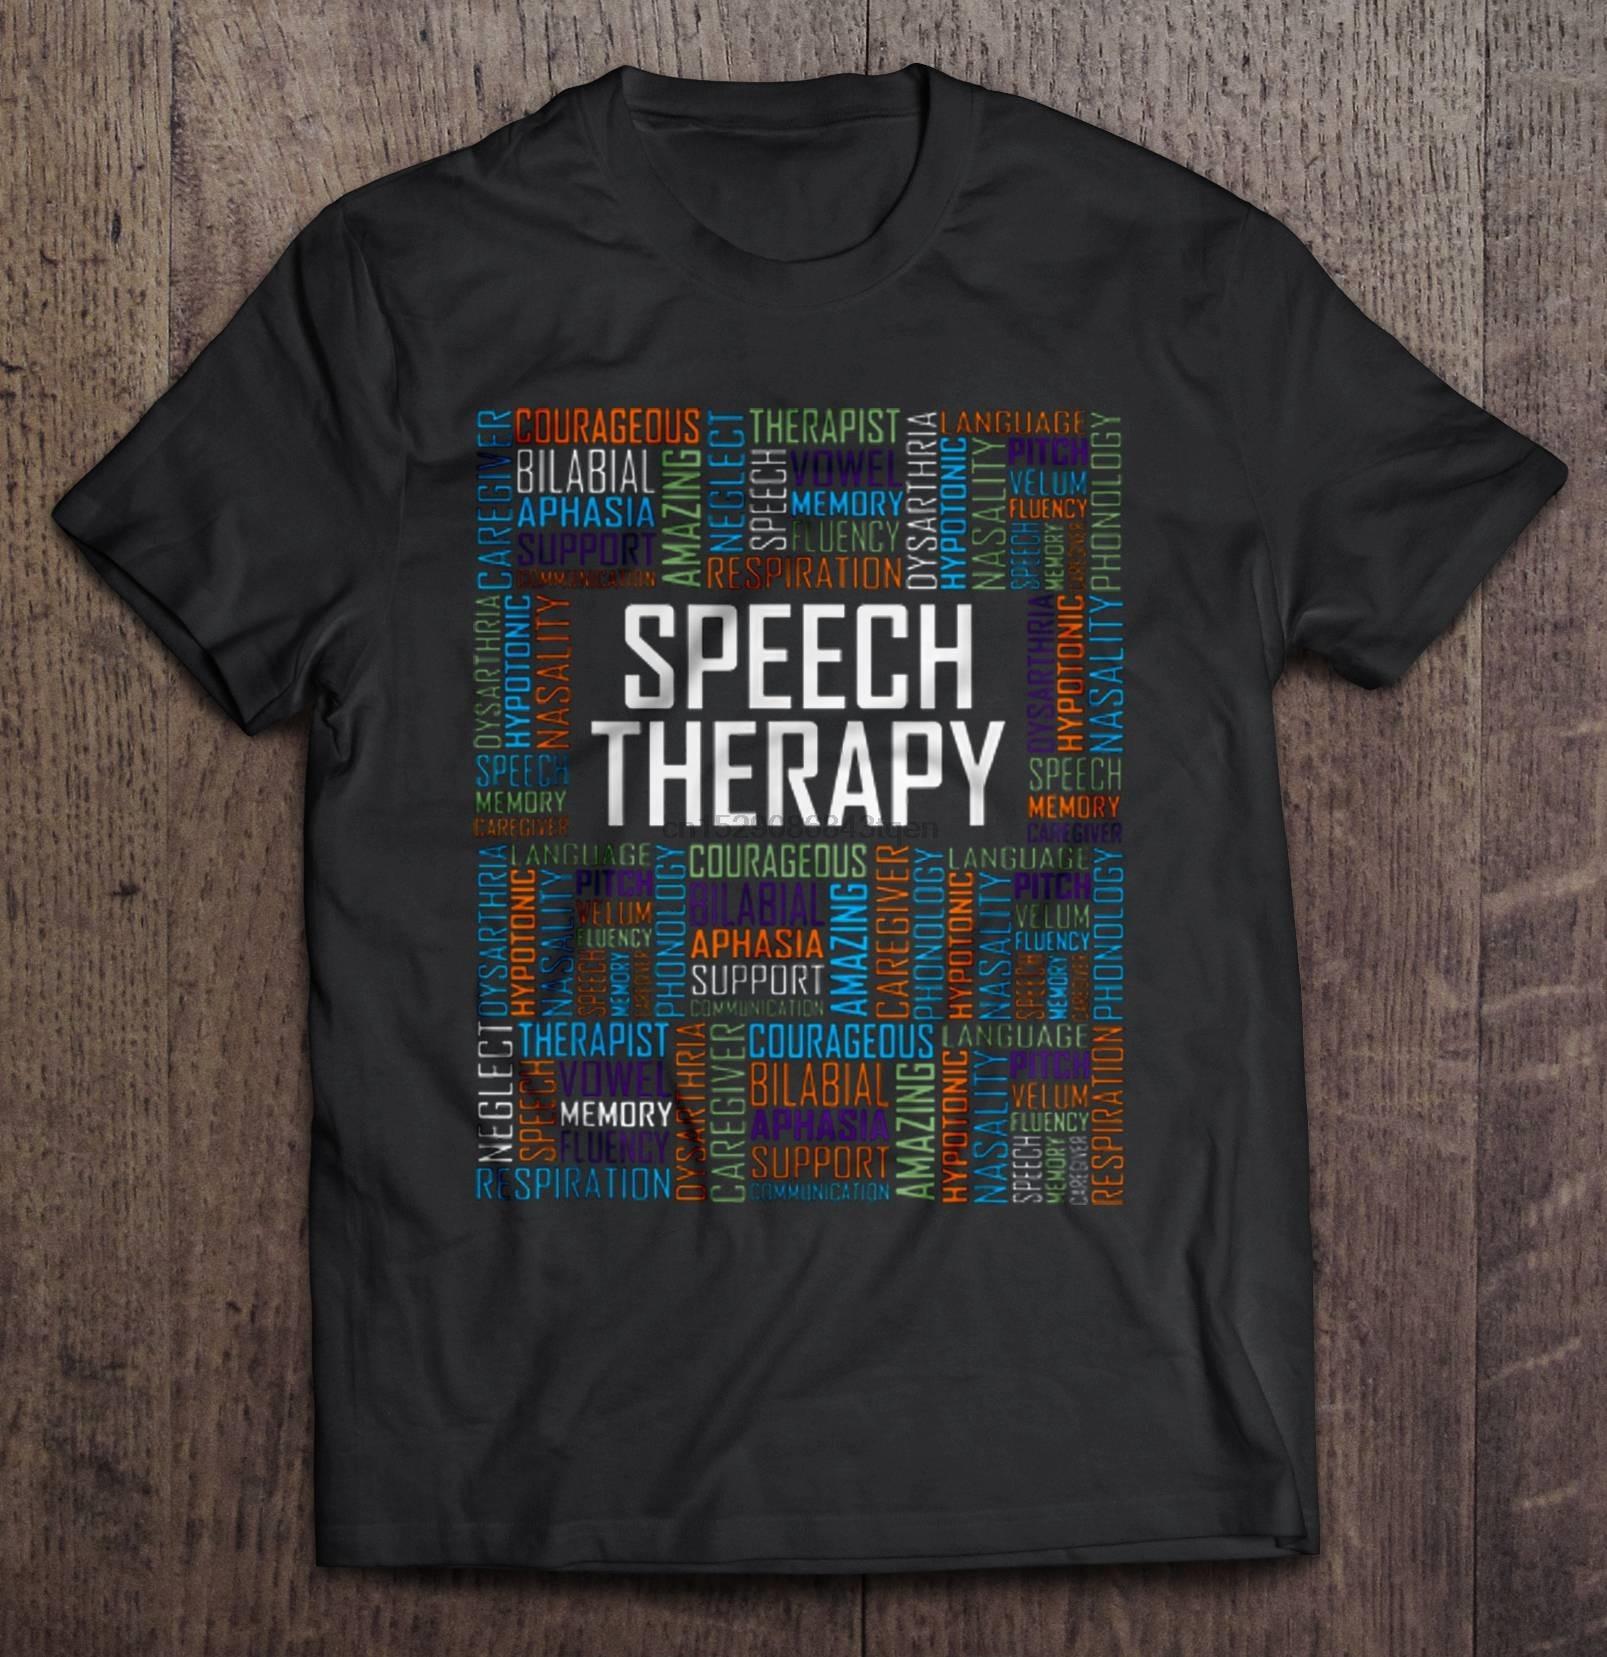 Courageous Bilabial Aphasia Therapist Women t-shirt Men Funny T Shirt Fashion tshirt Speech Therapy Caregiver(China)